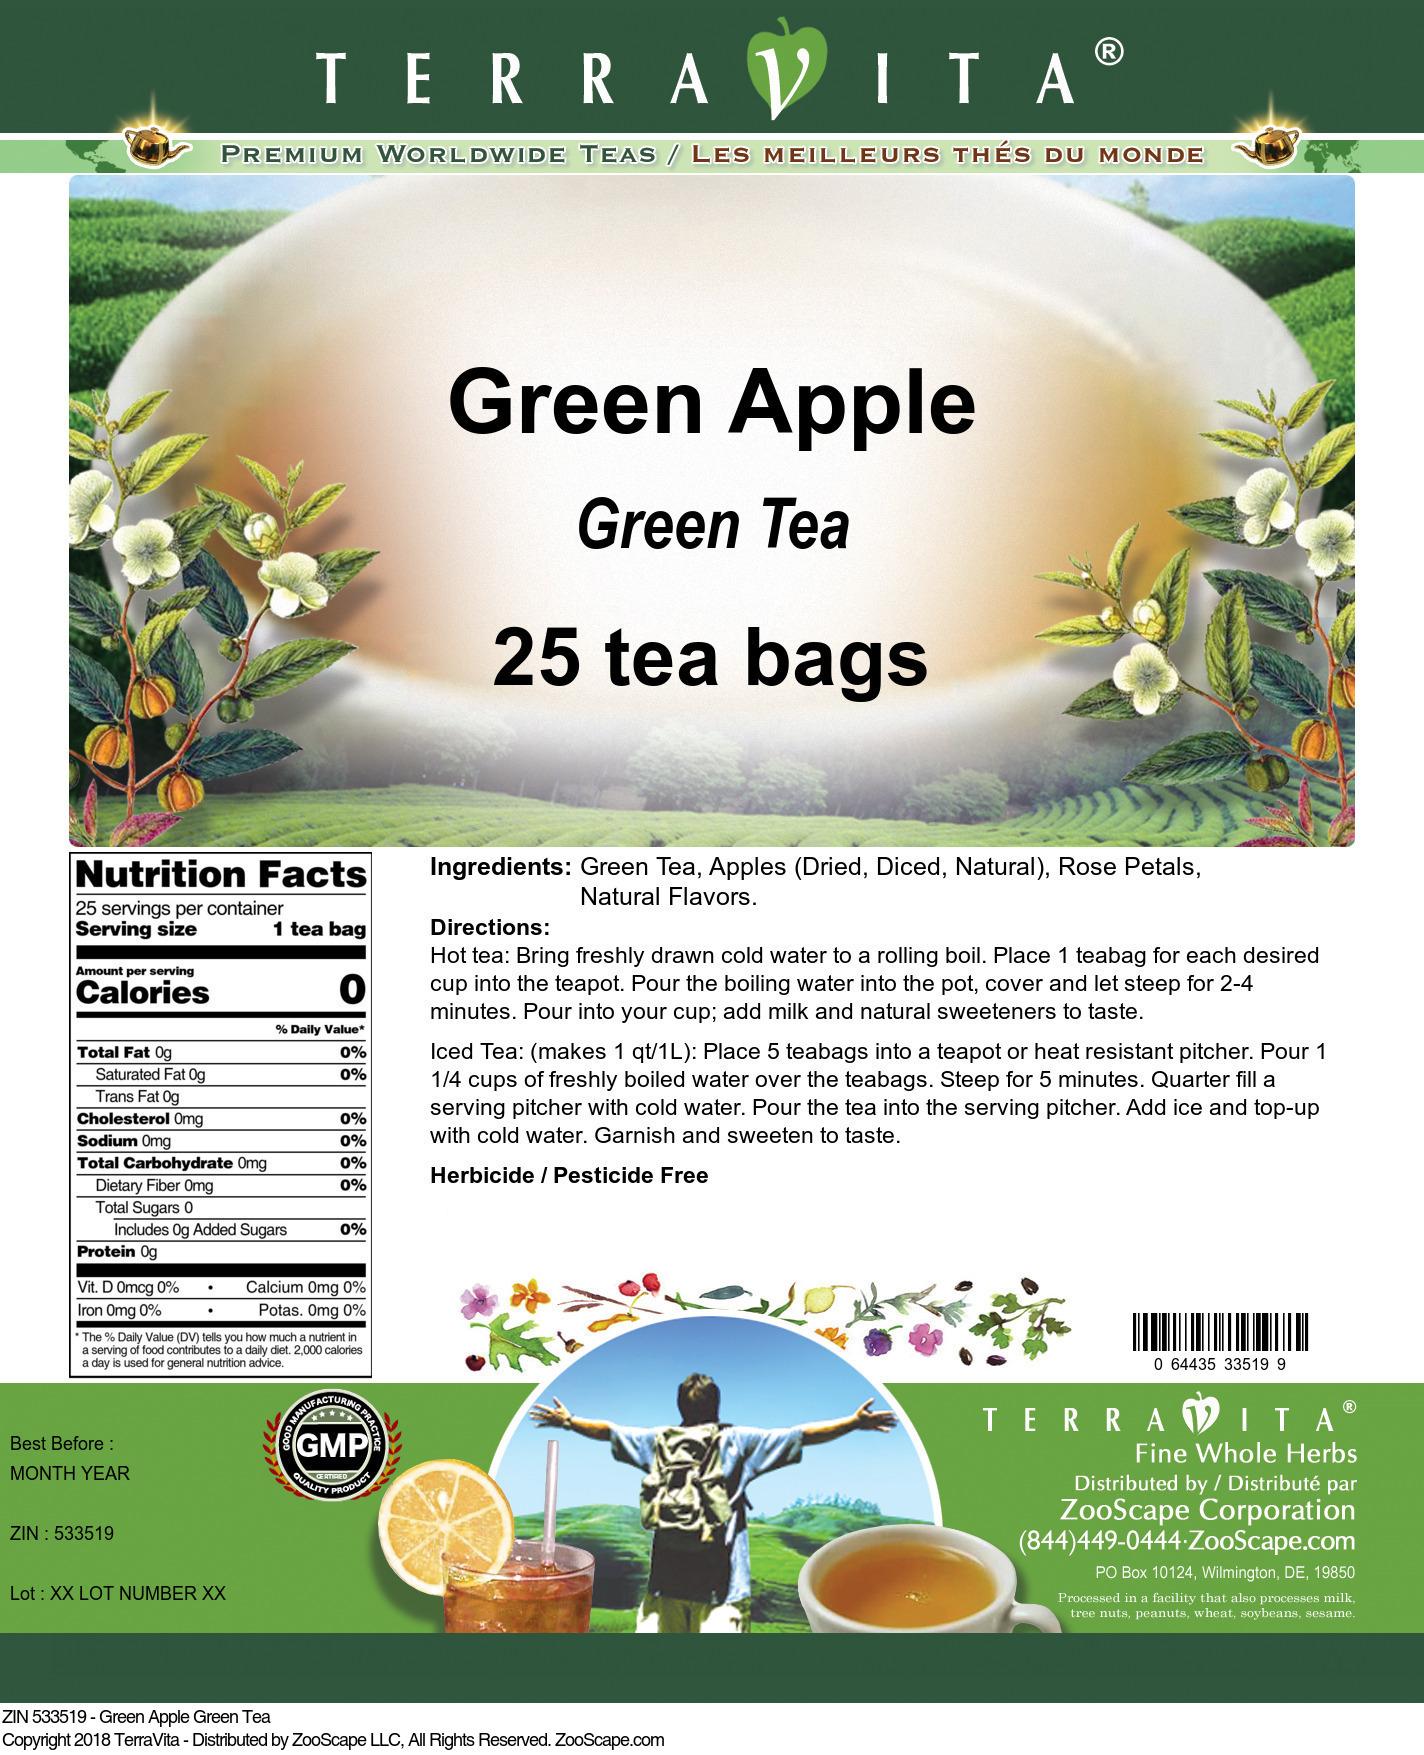 Green Apple Green Tea